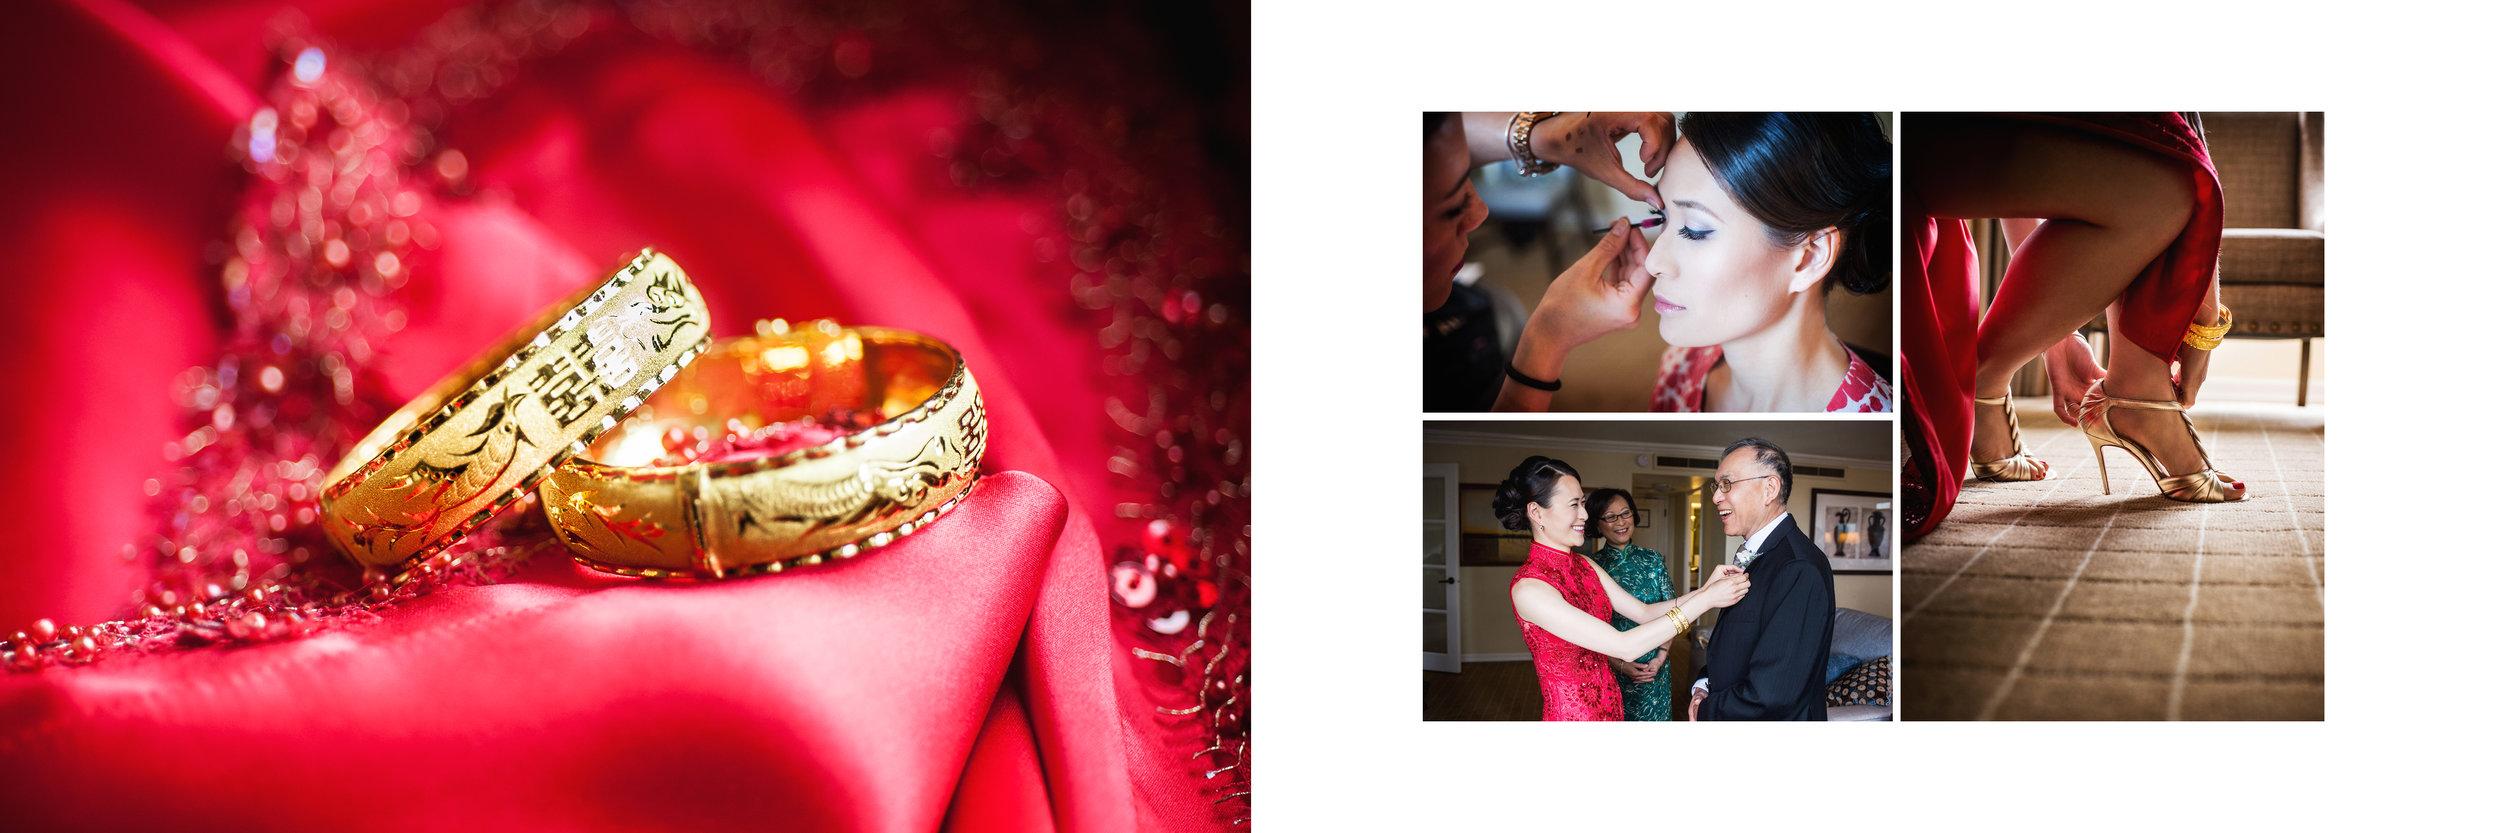 Andrea-Reuben-Grouse-Mountain-Wedding-Real-Weddings-Feature-Yaletown-Photography-002.jpg